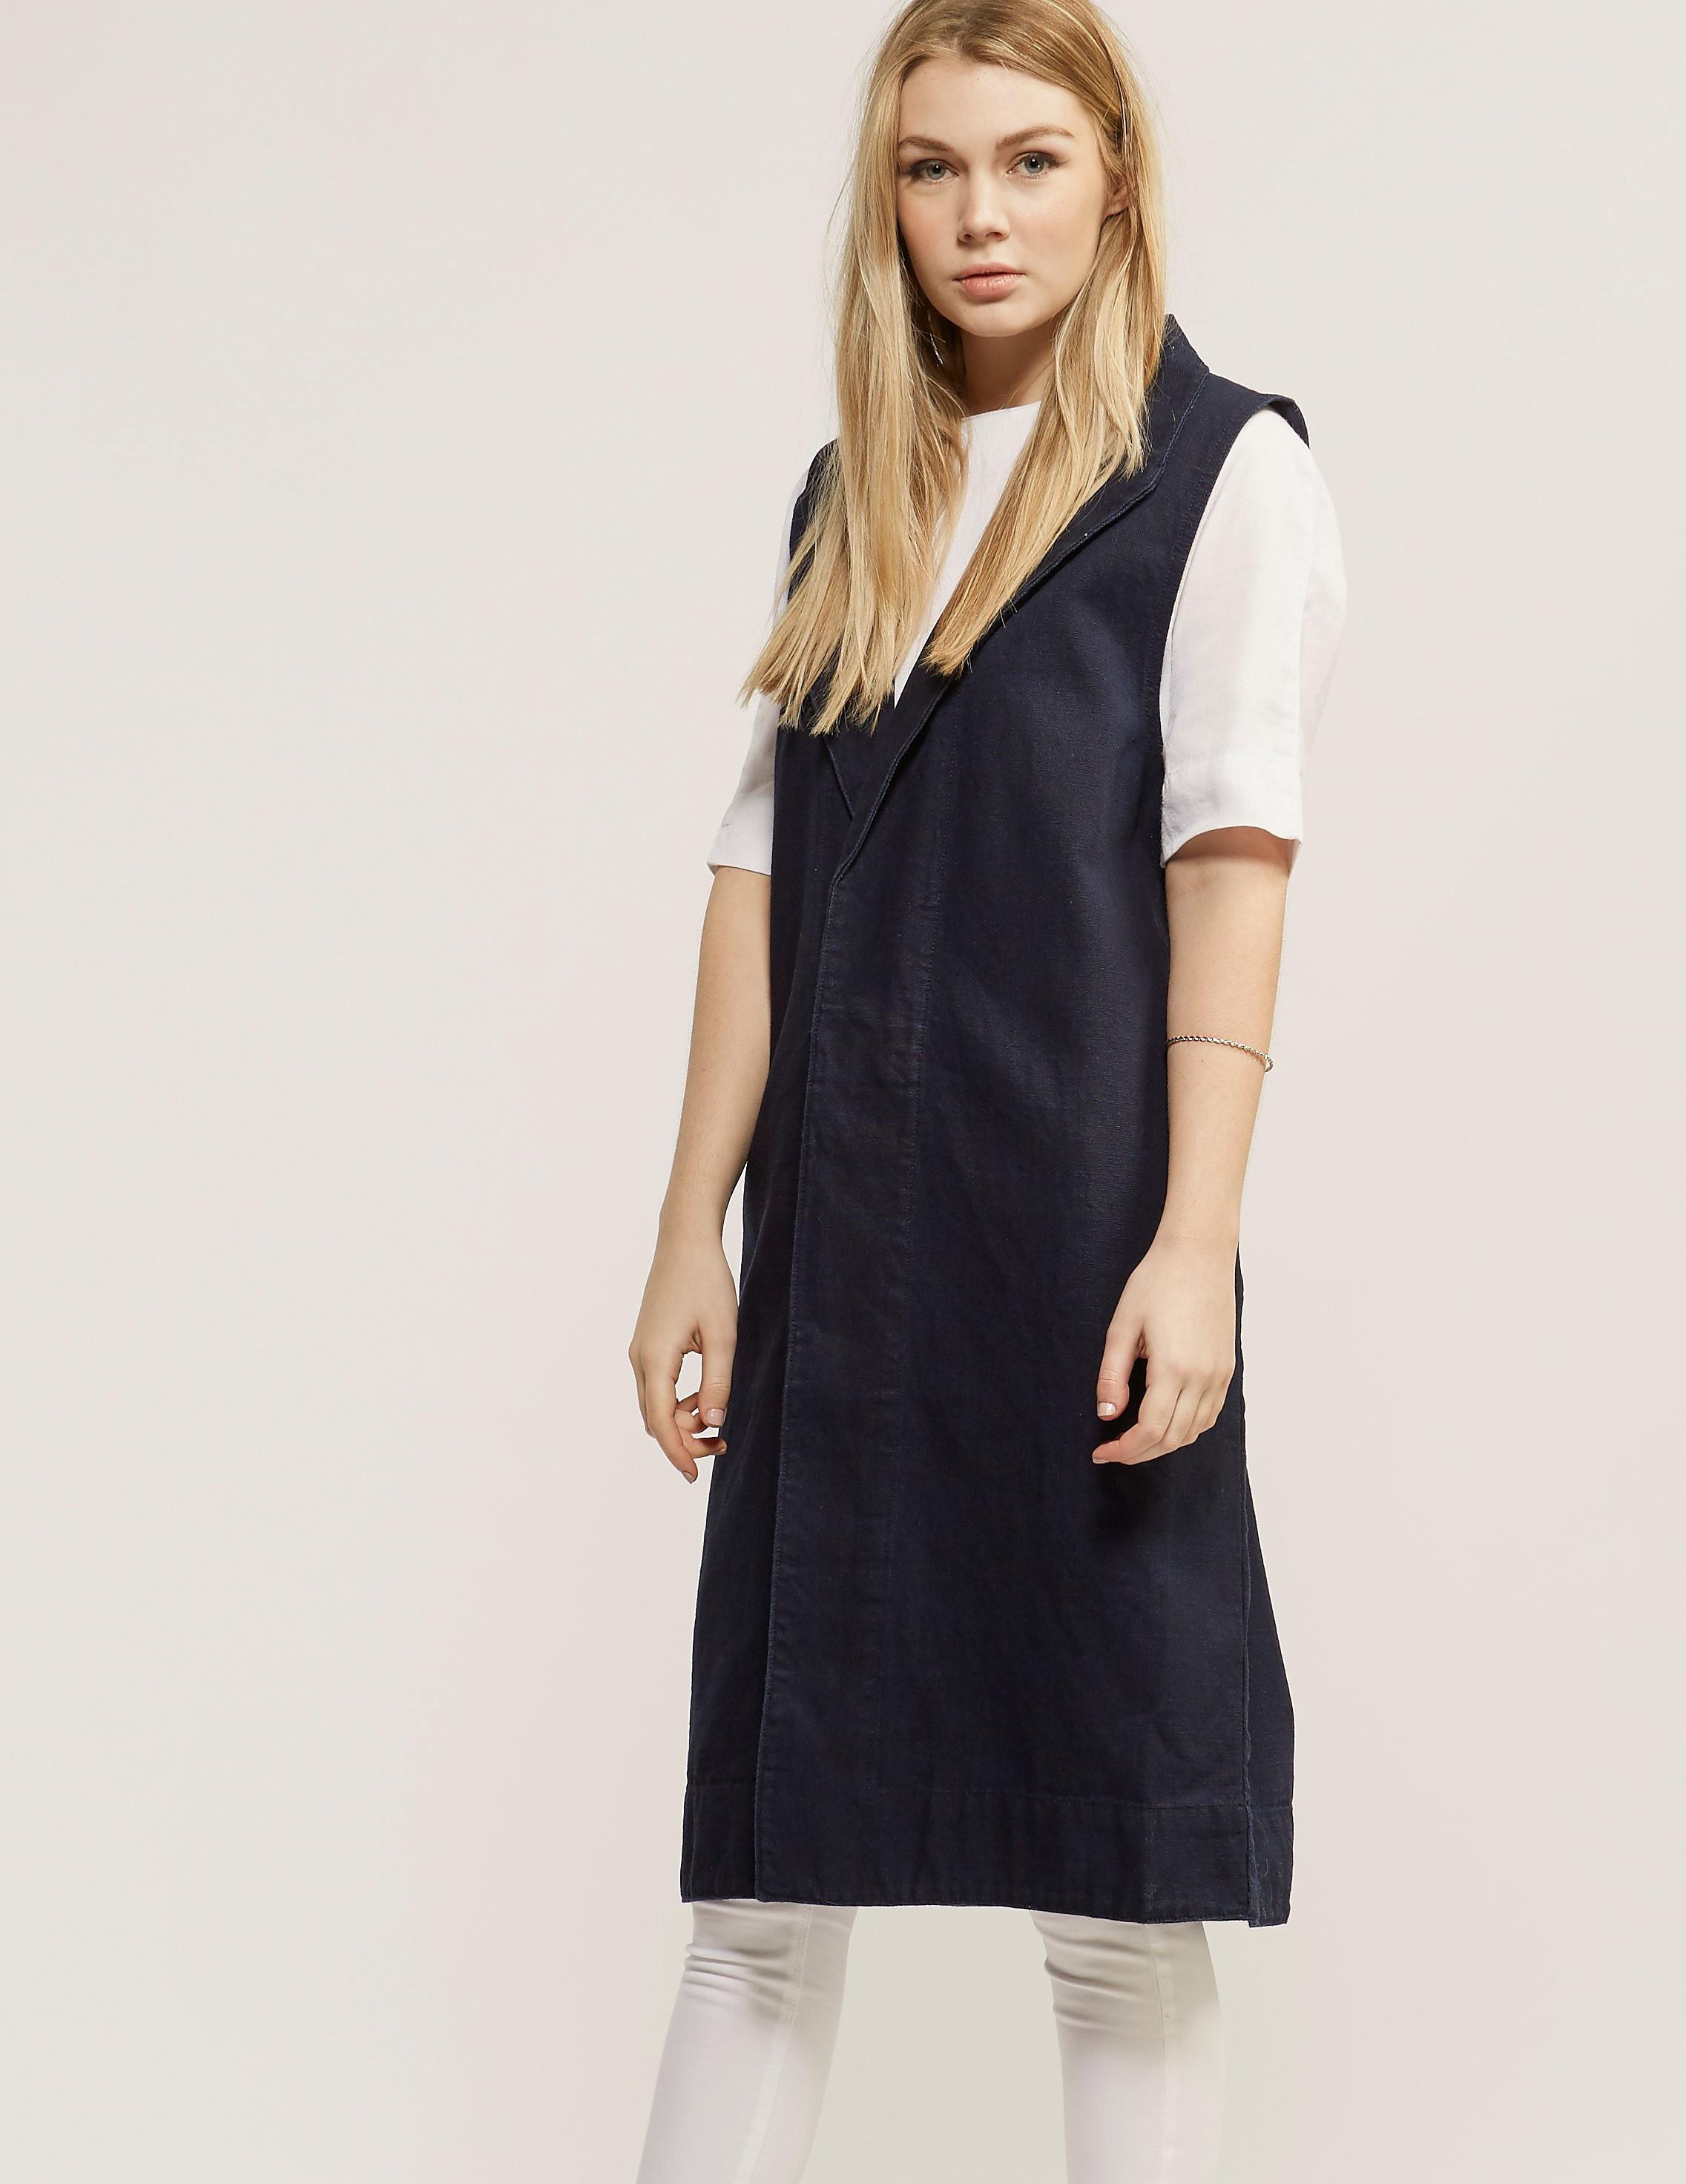 WAVEN Longline Waist Coat